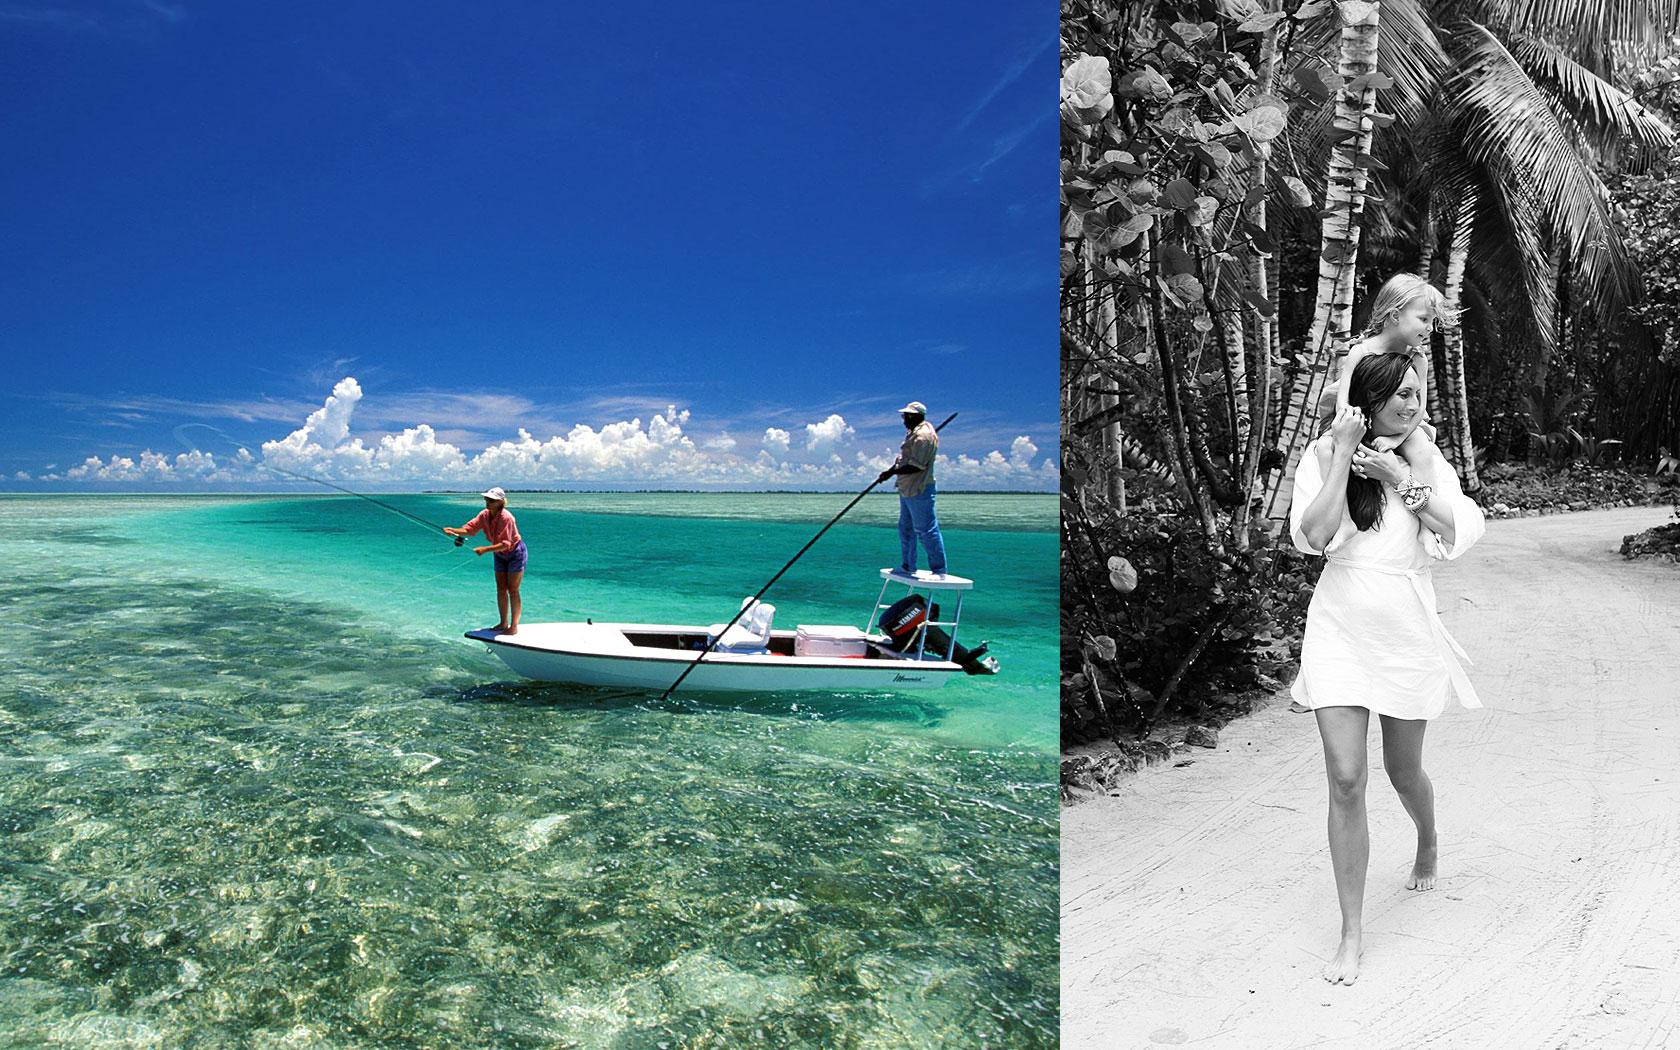 kamalame-cay-andros-bahamas